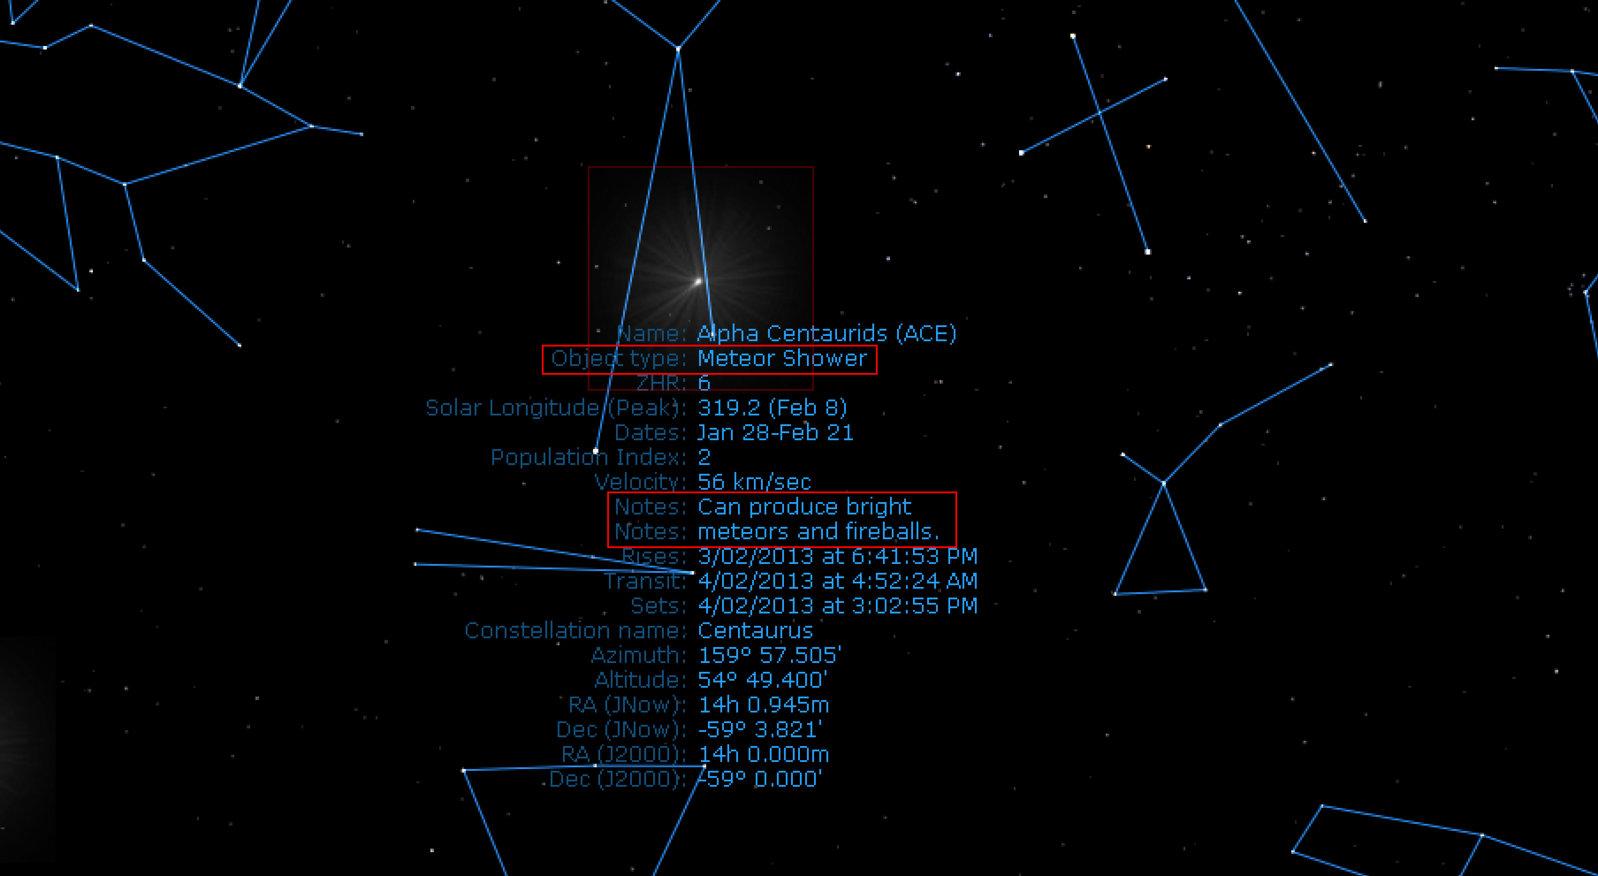 3864_GreenAnomaly-MeteorShower.jpg